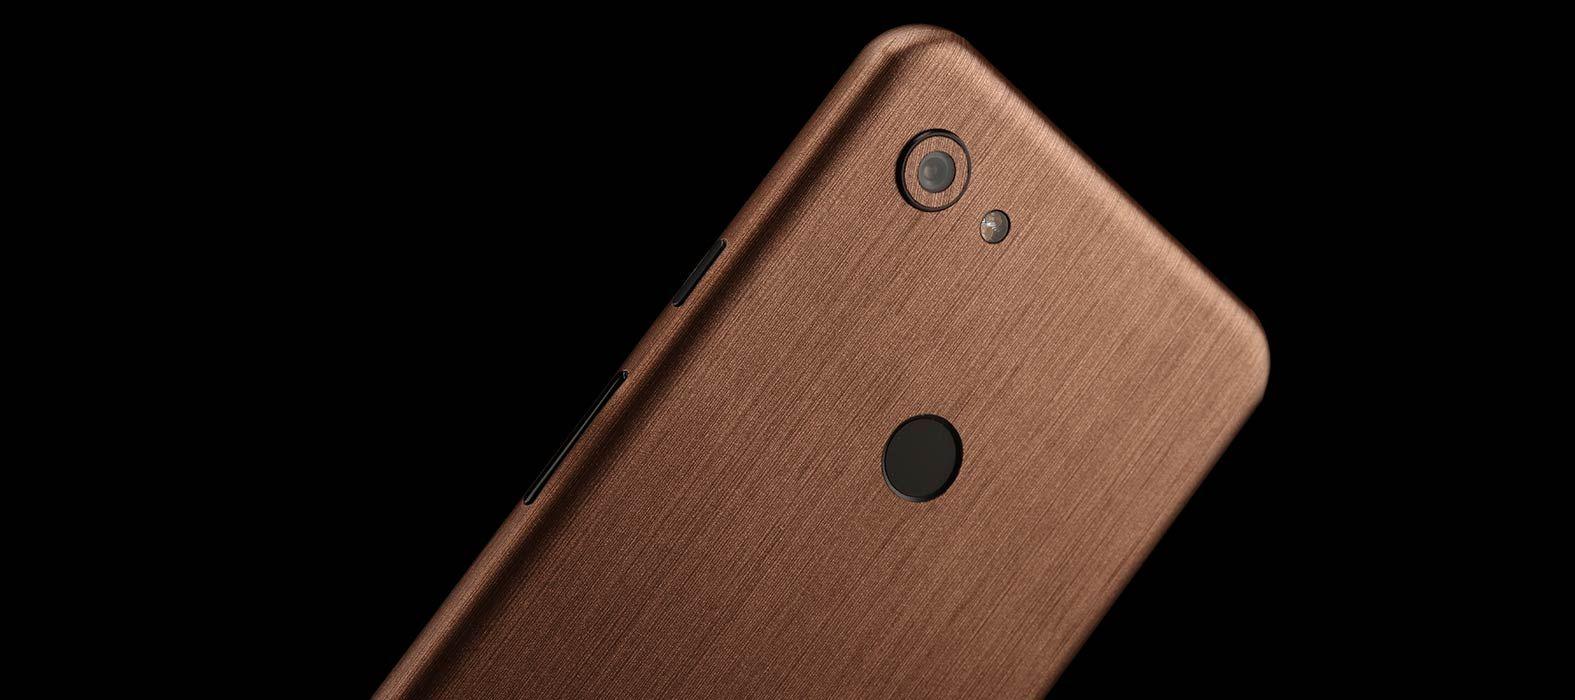 Pixel-3A-XL-Brushed-Copper-Skins.